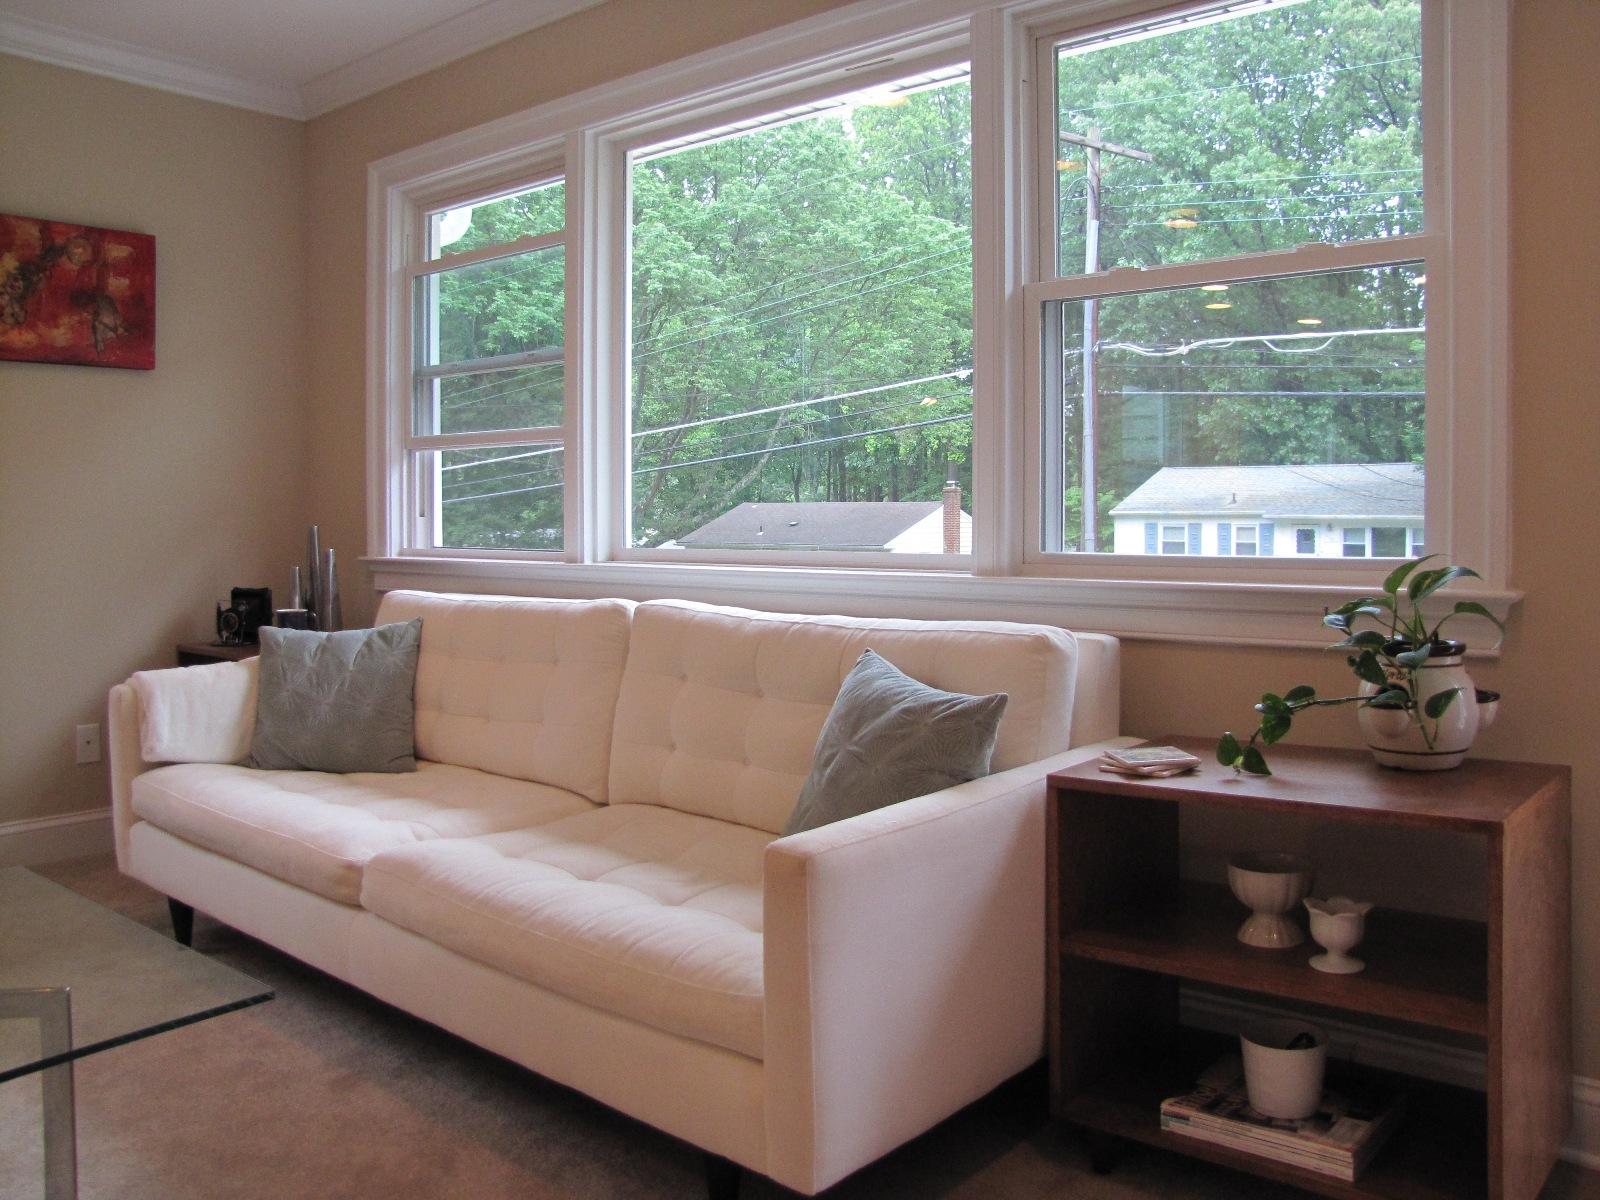 Reupholstered Sofa Fabrics